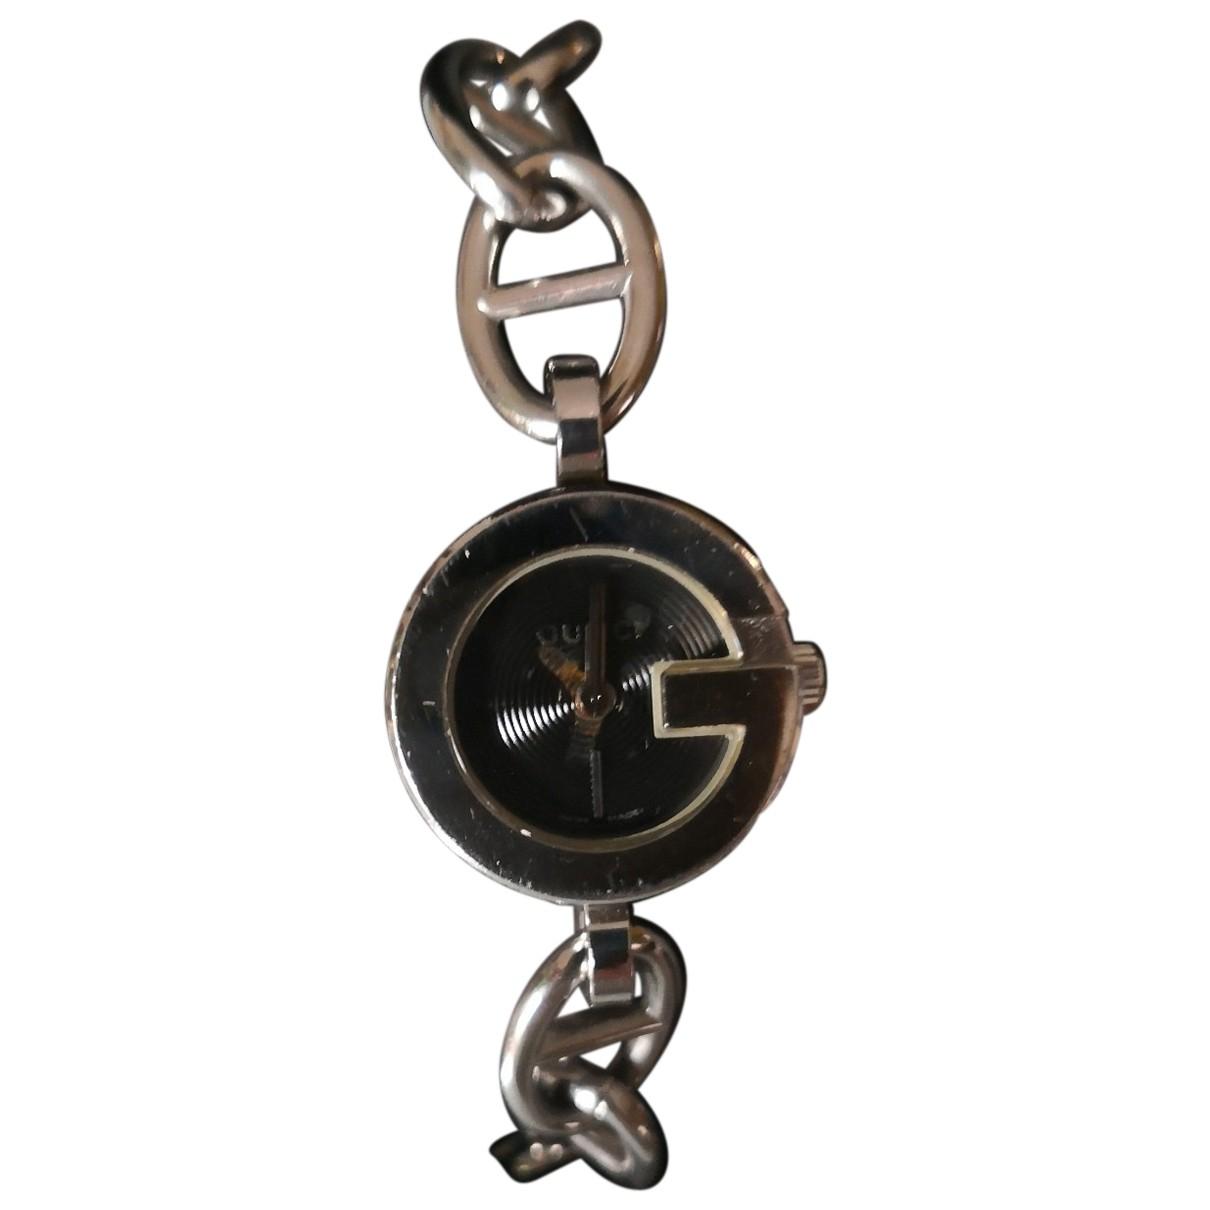 Gucci Signora Uhr in  Silber Stahl